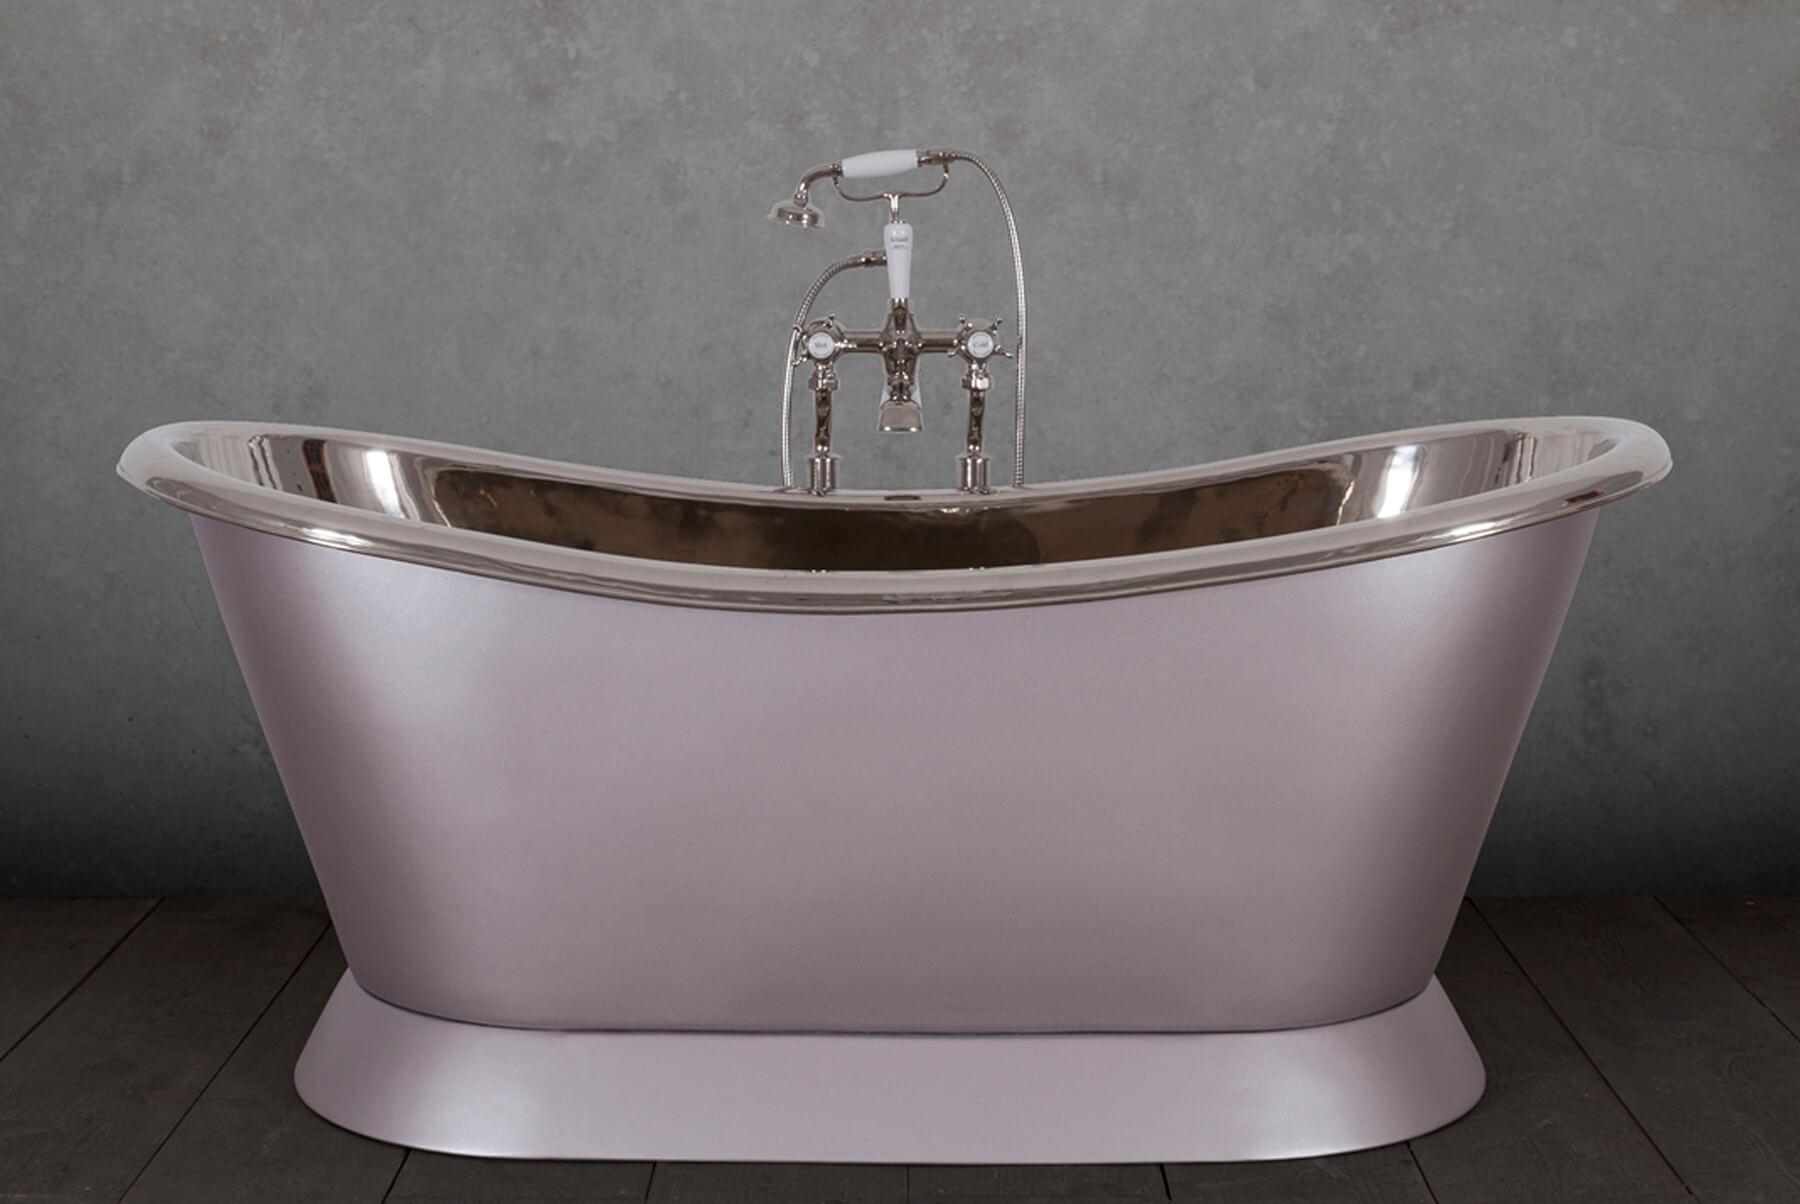 Bath-Tubs-Hurlinghma-copper-bateau-nickel-interior-roberson-silver-blush-1800x1204